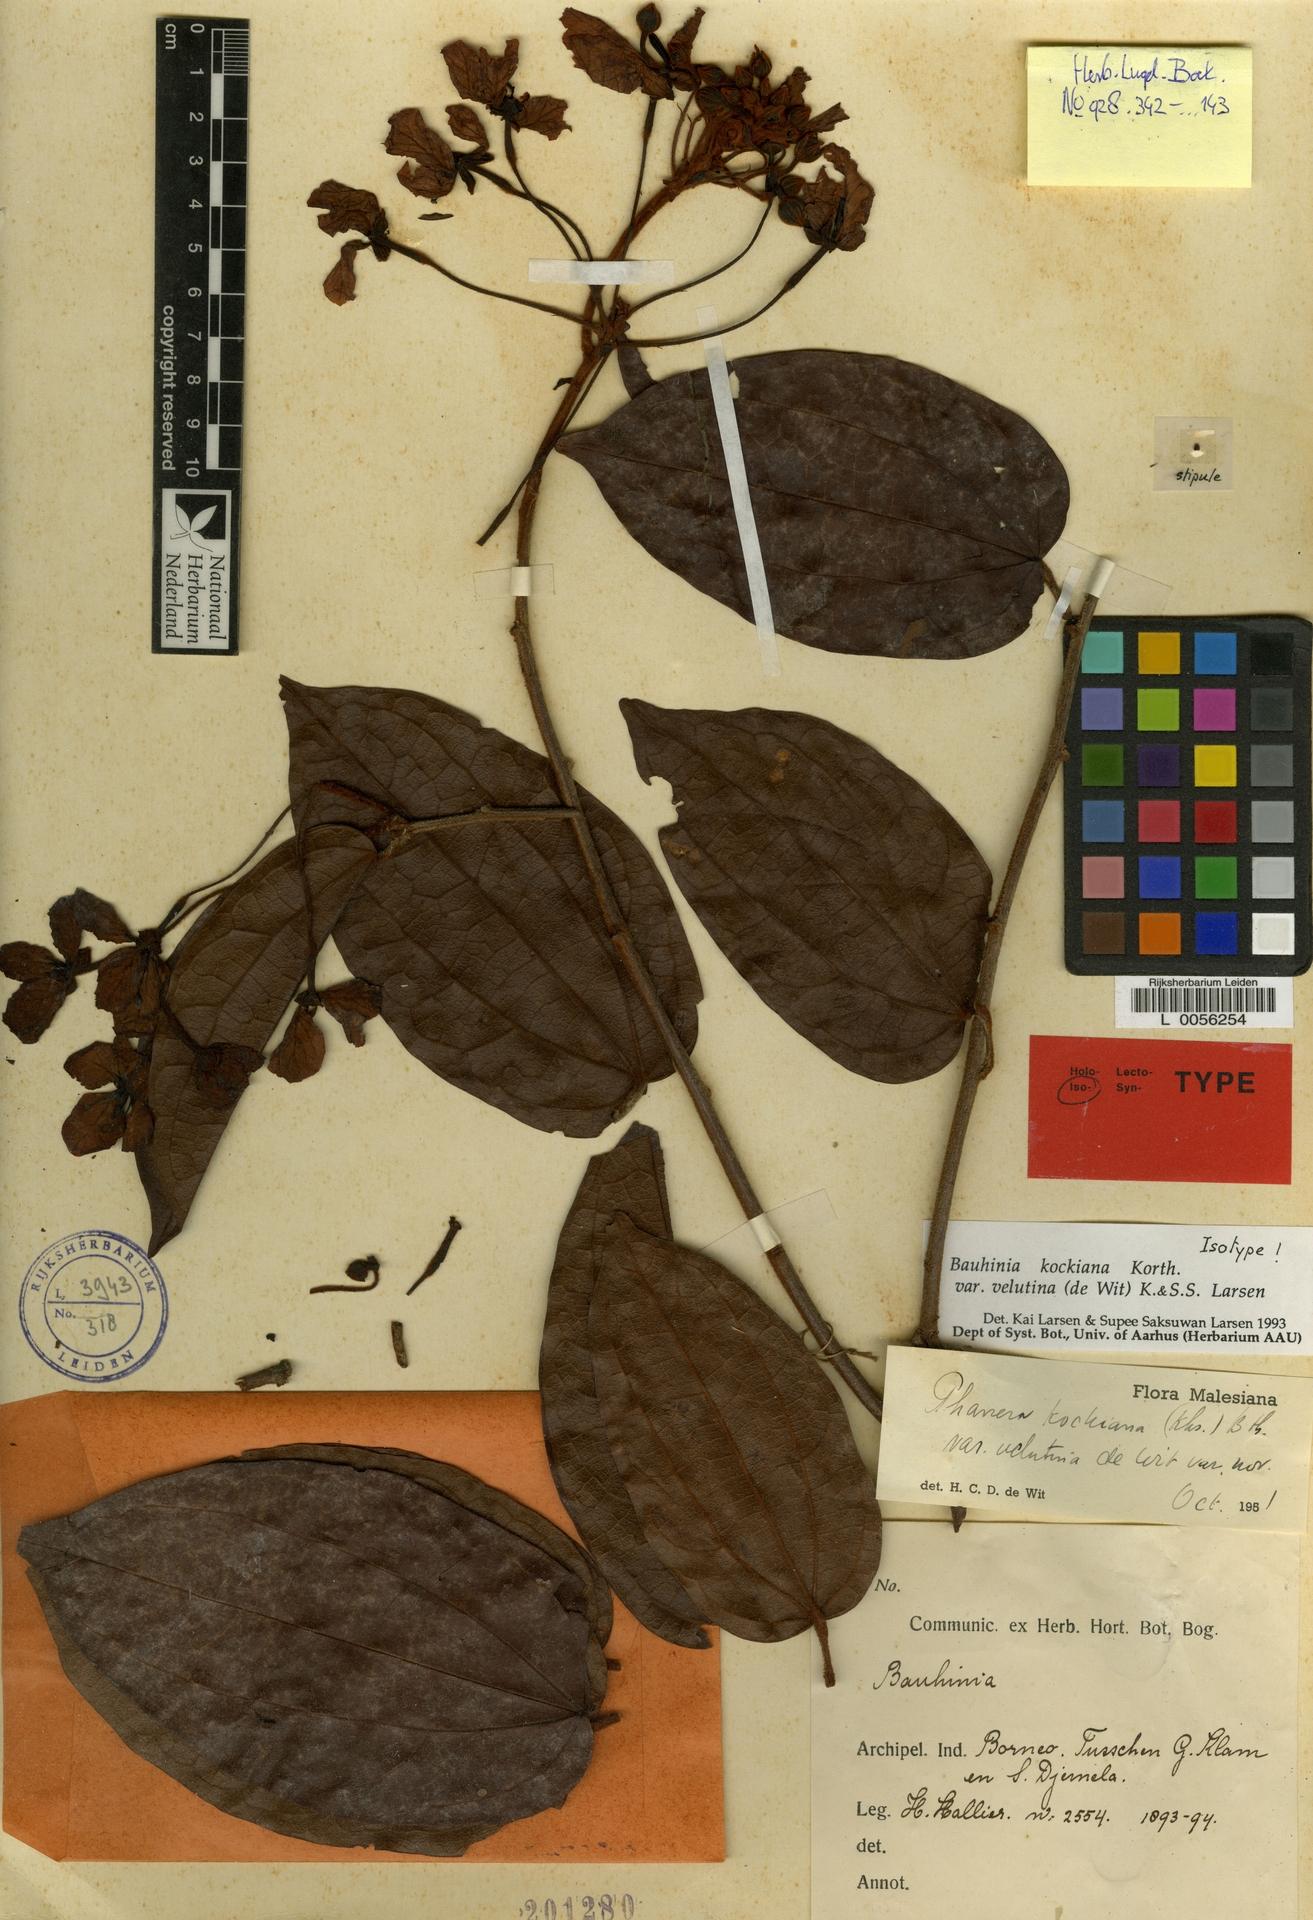 L  0056254 | Bauhinia kockiana var. velutina (de Wit) K.Larsen & S.S.Larsen